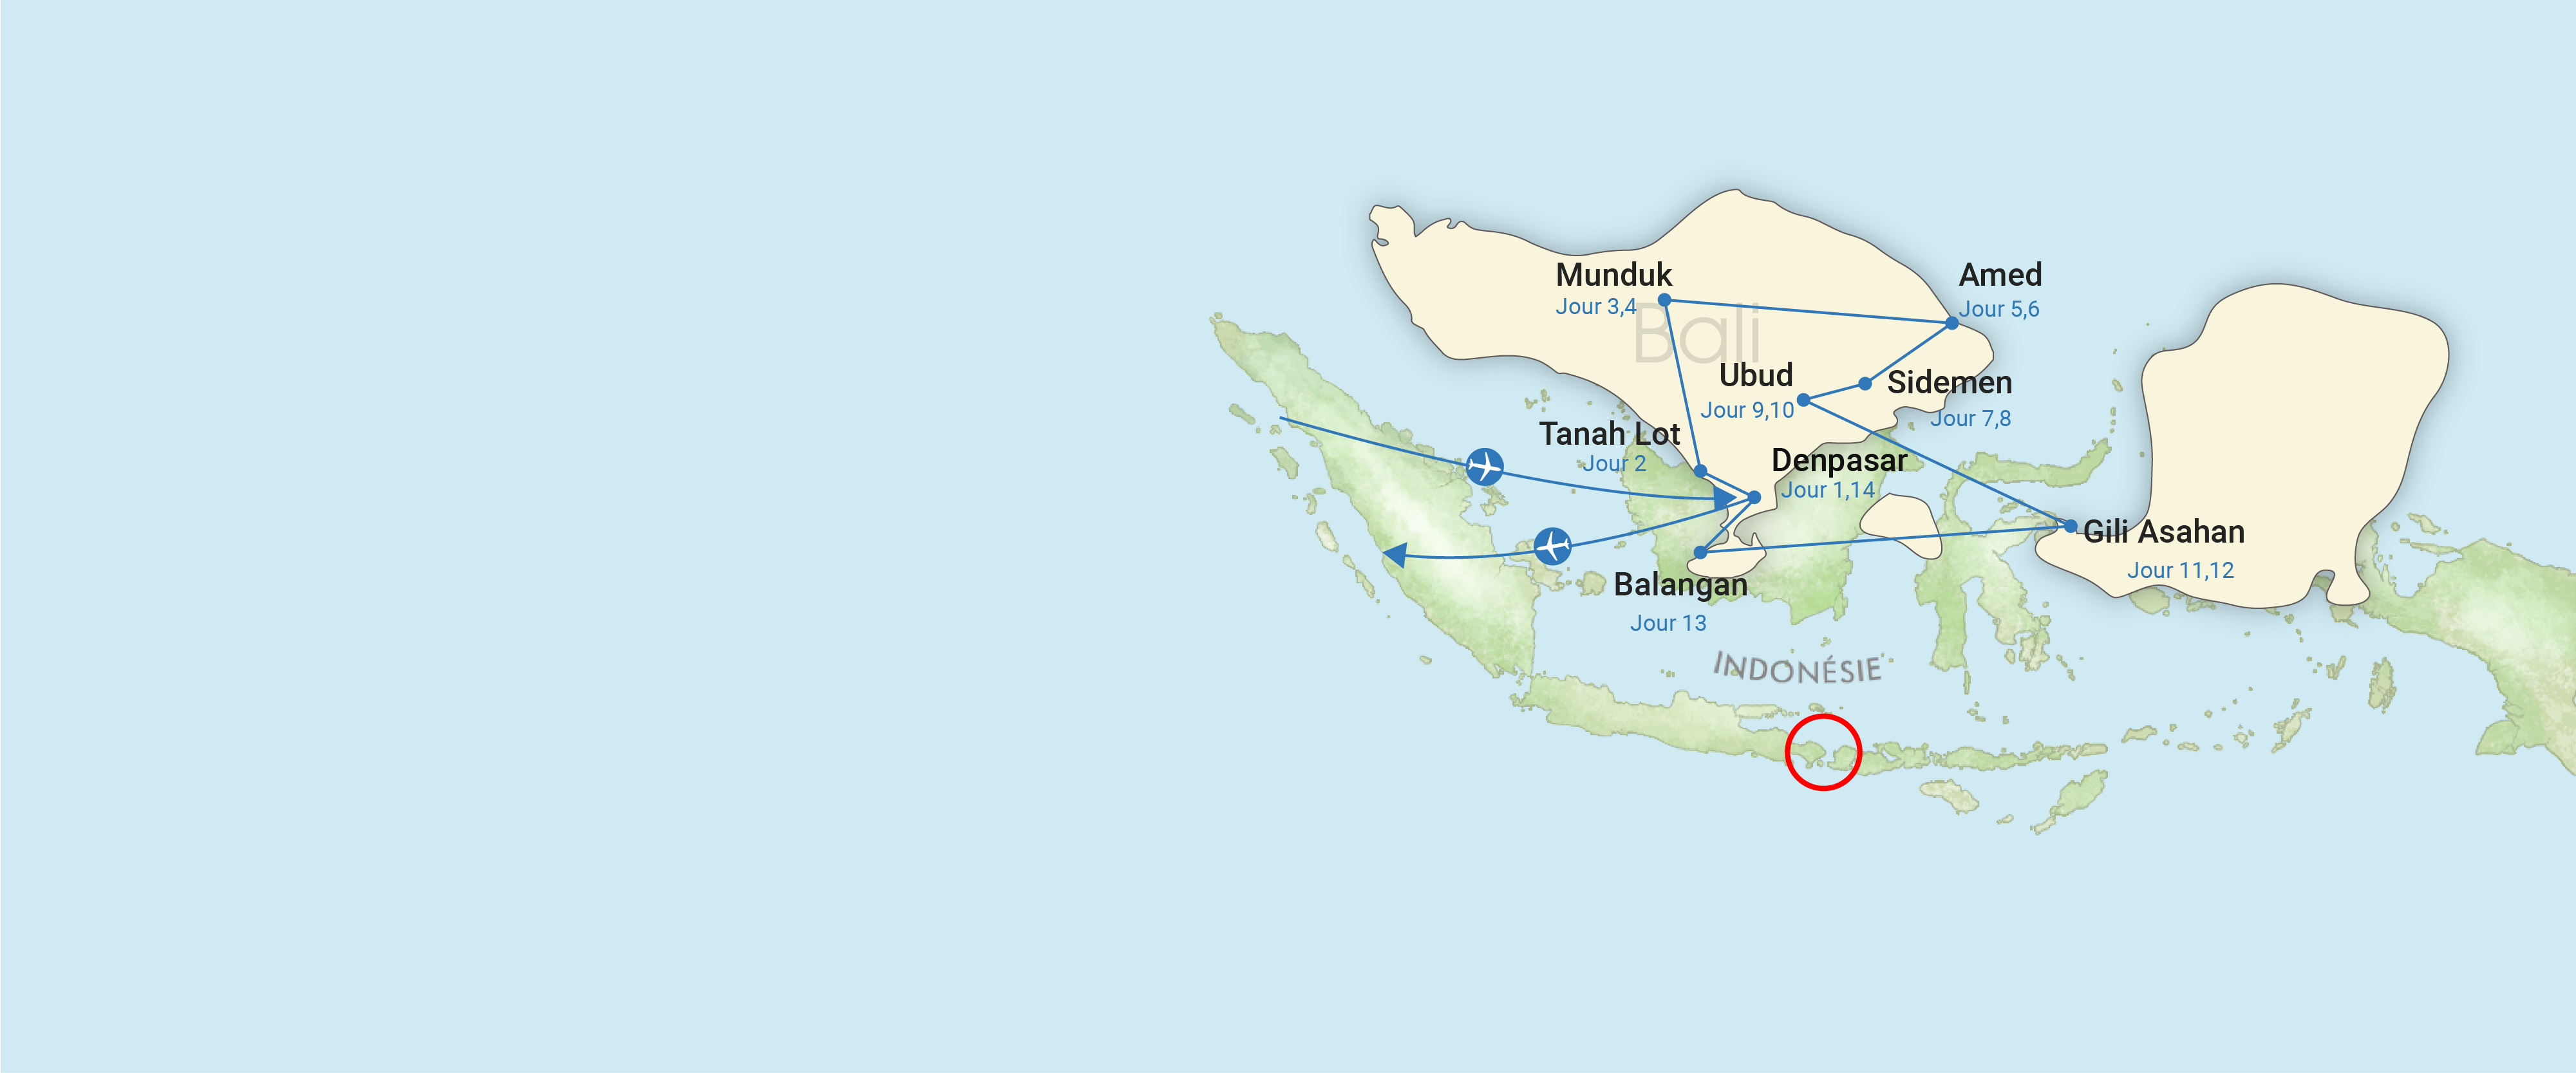 indonesie, carte, voyage, asiatica travel, merveilles de bali